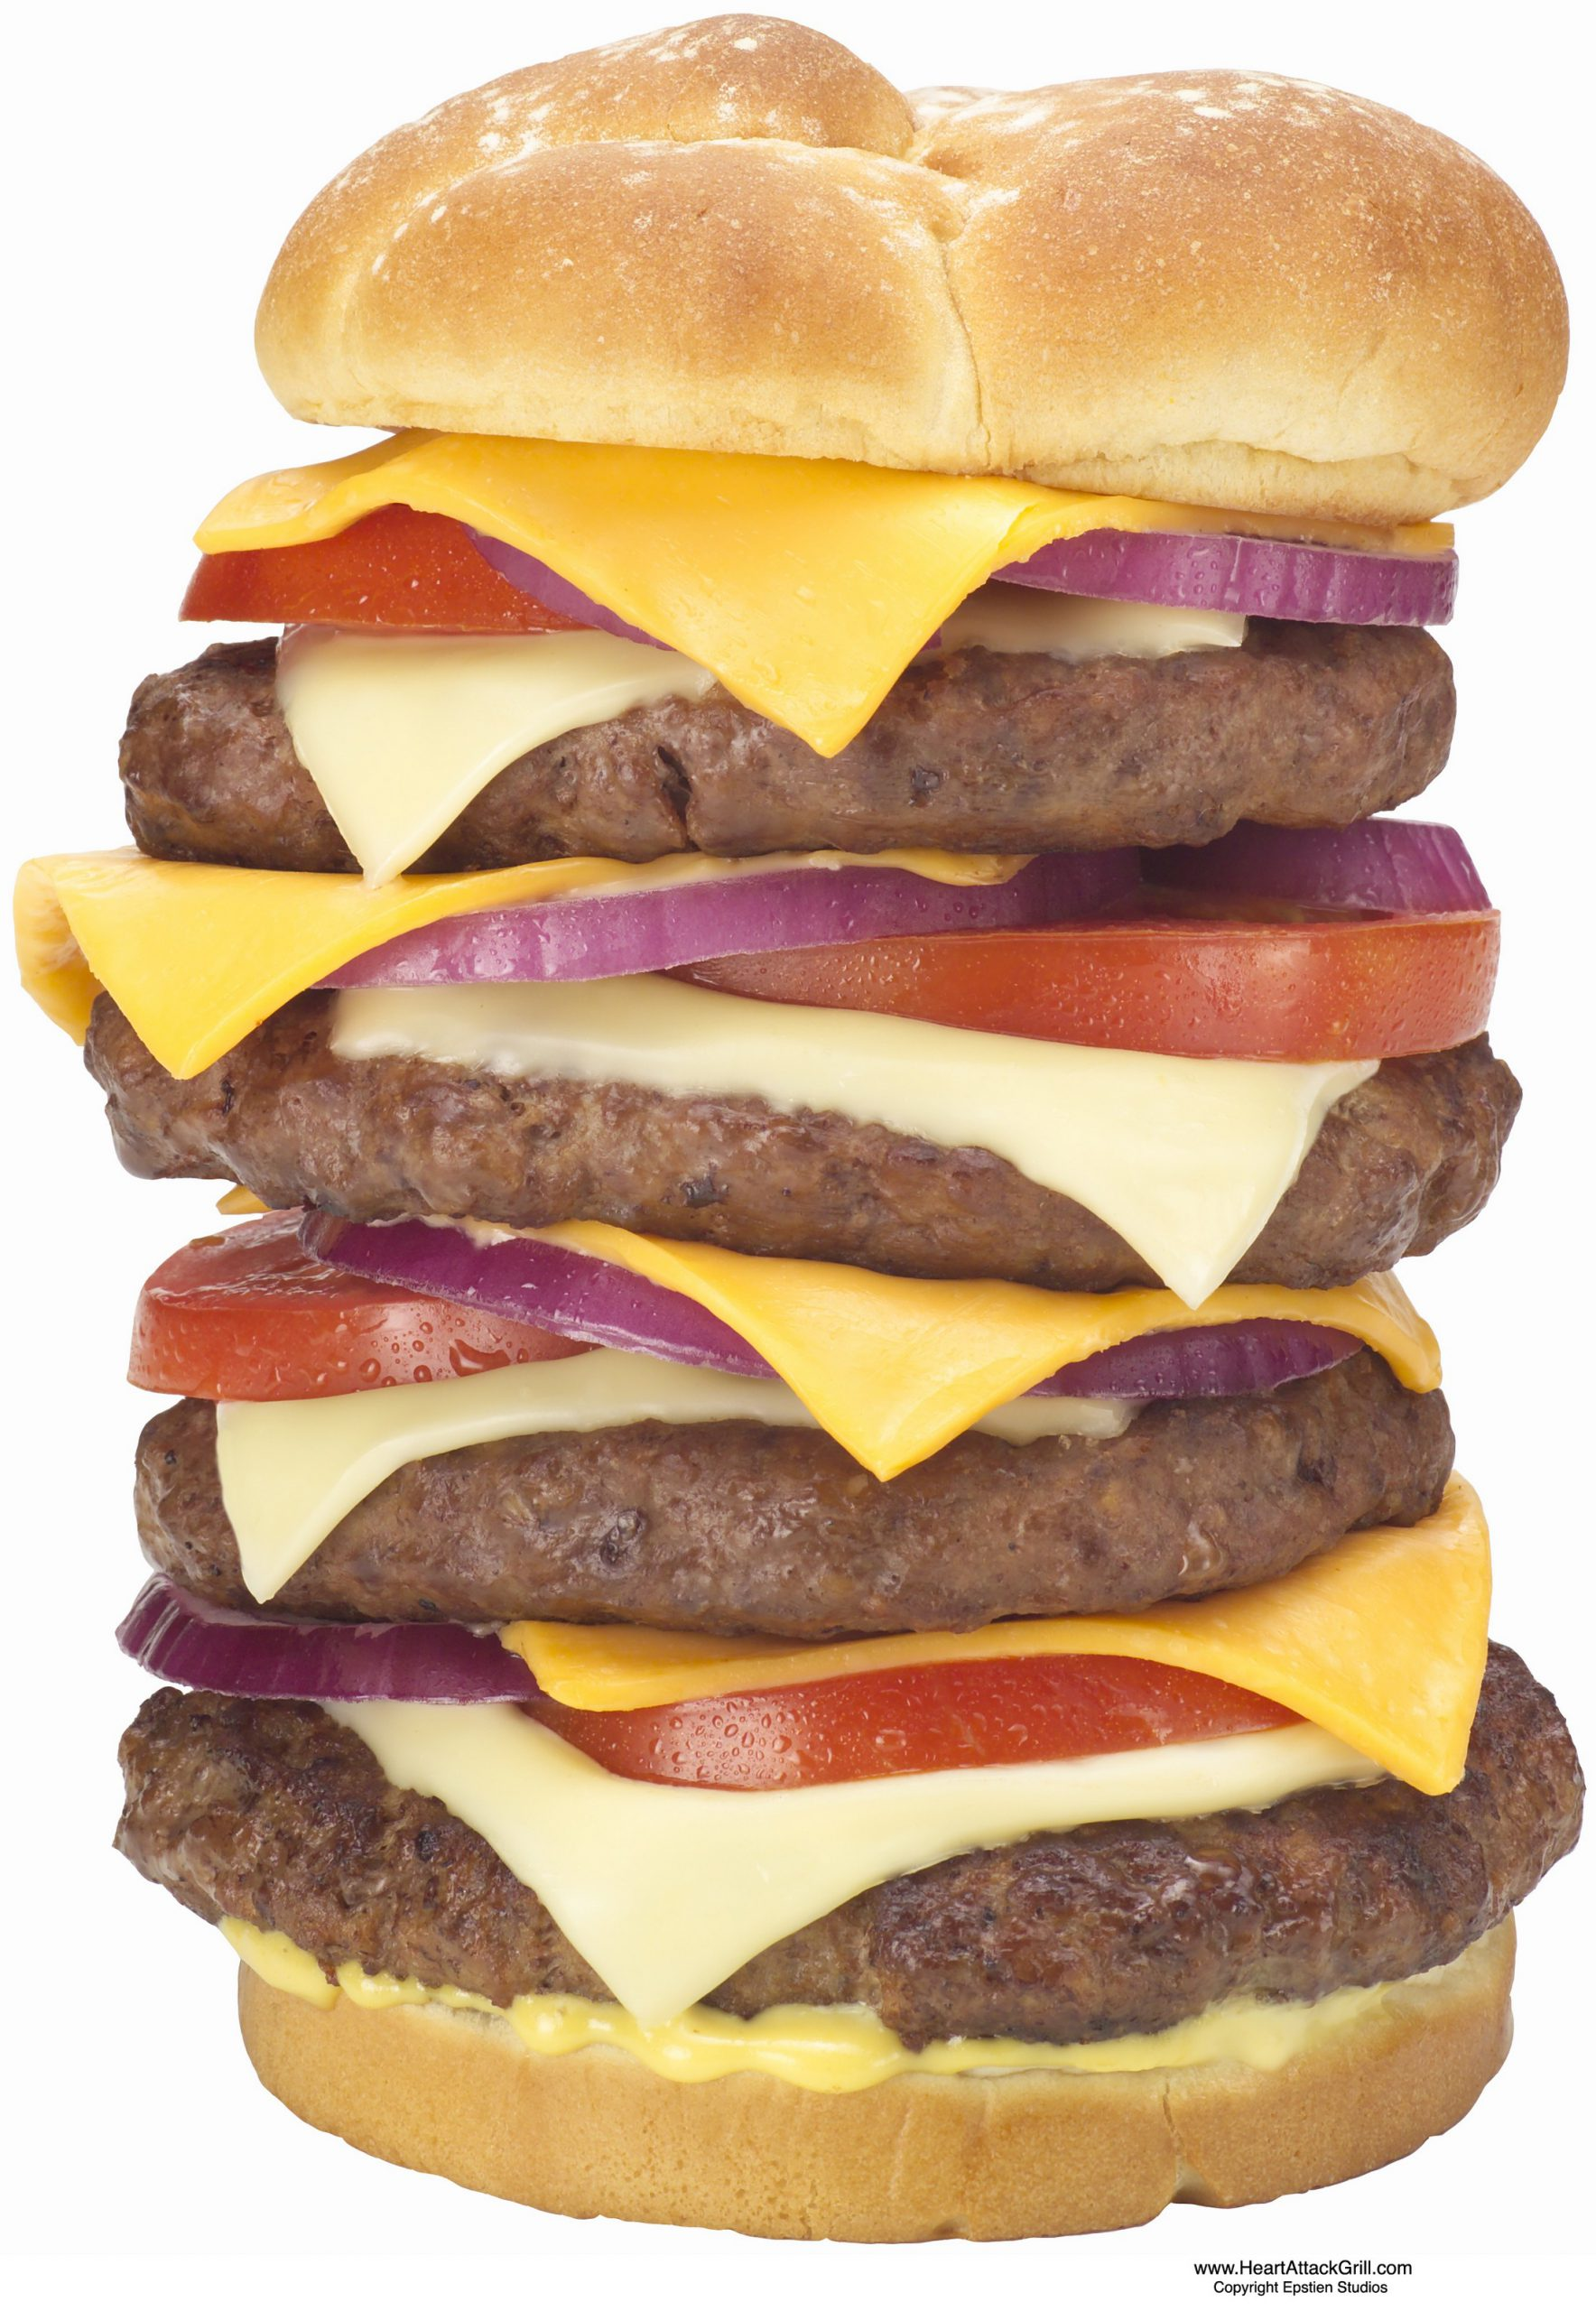 Hamburguesa quadruple Bypass del Heart Attack Grill (1)